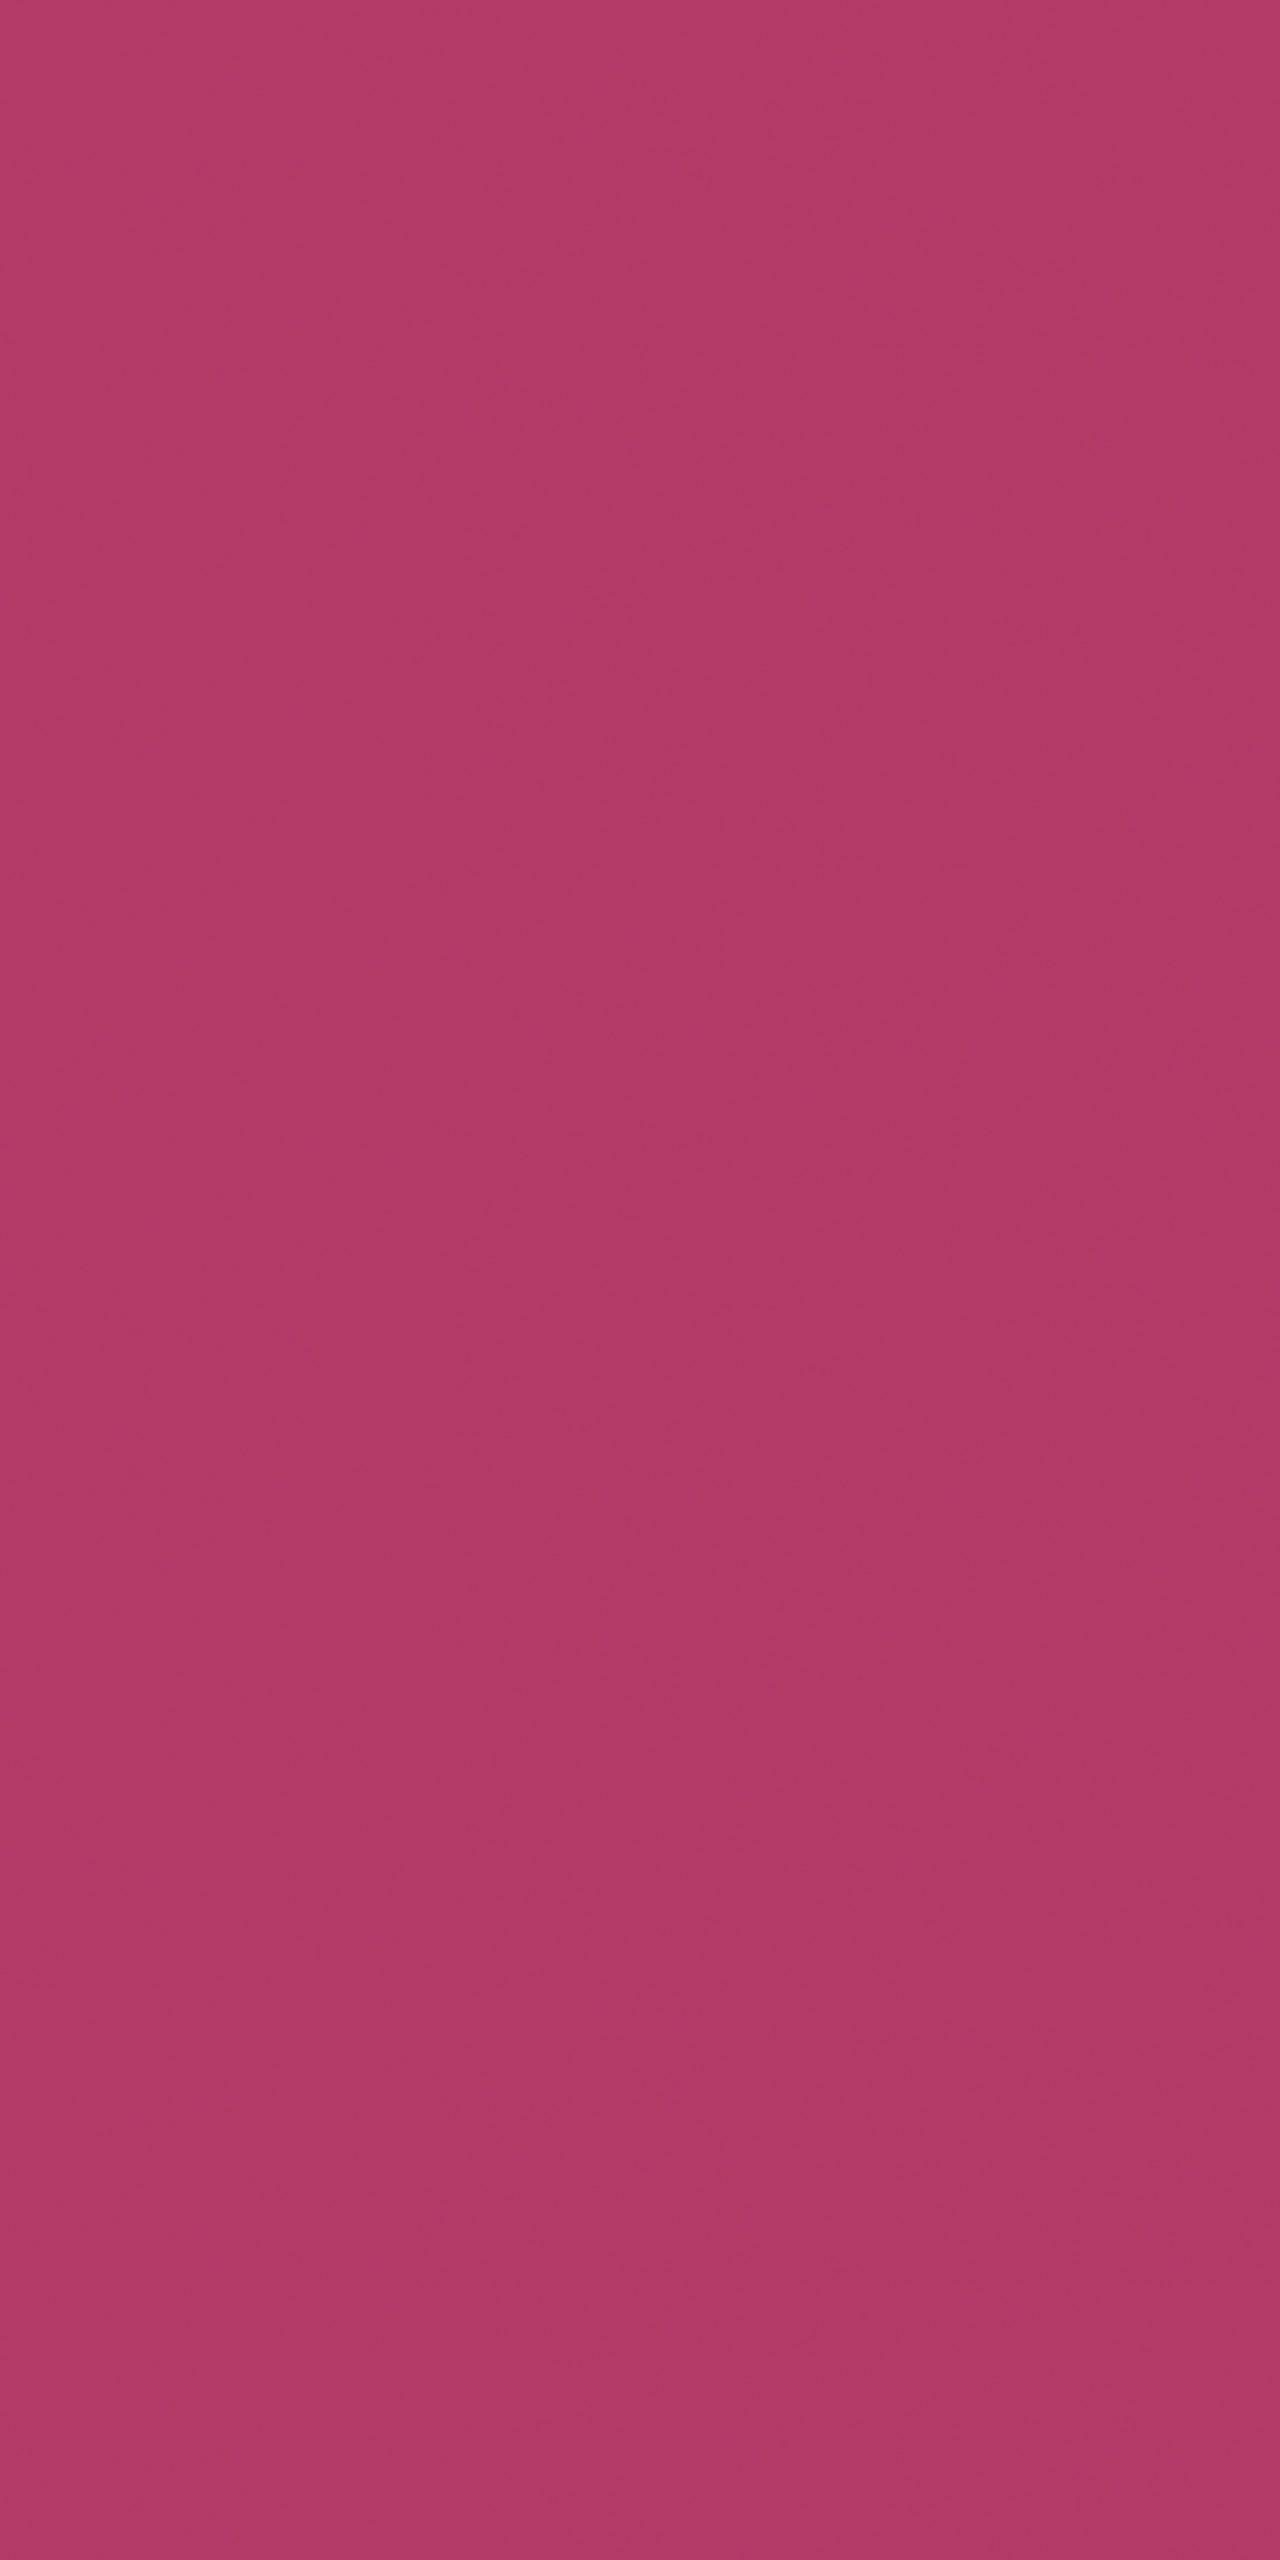 Buildtech 2.0 Bold Colors Fuchsia Glossy 6mm 120 x 240